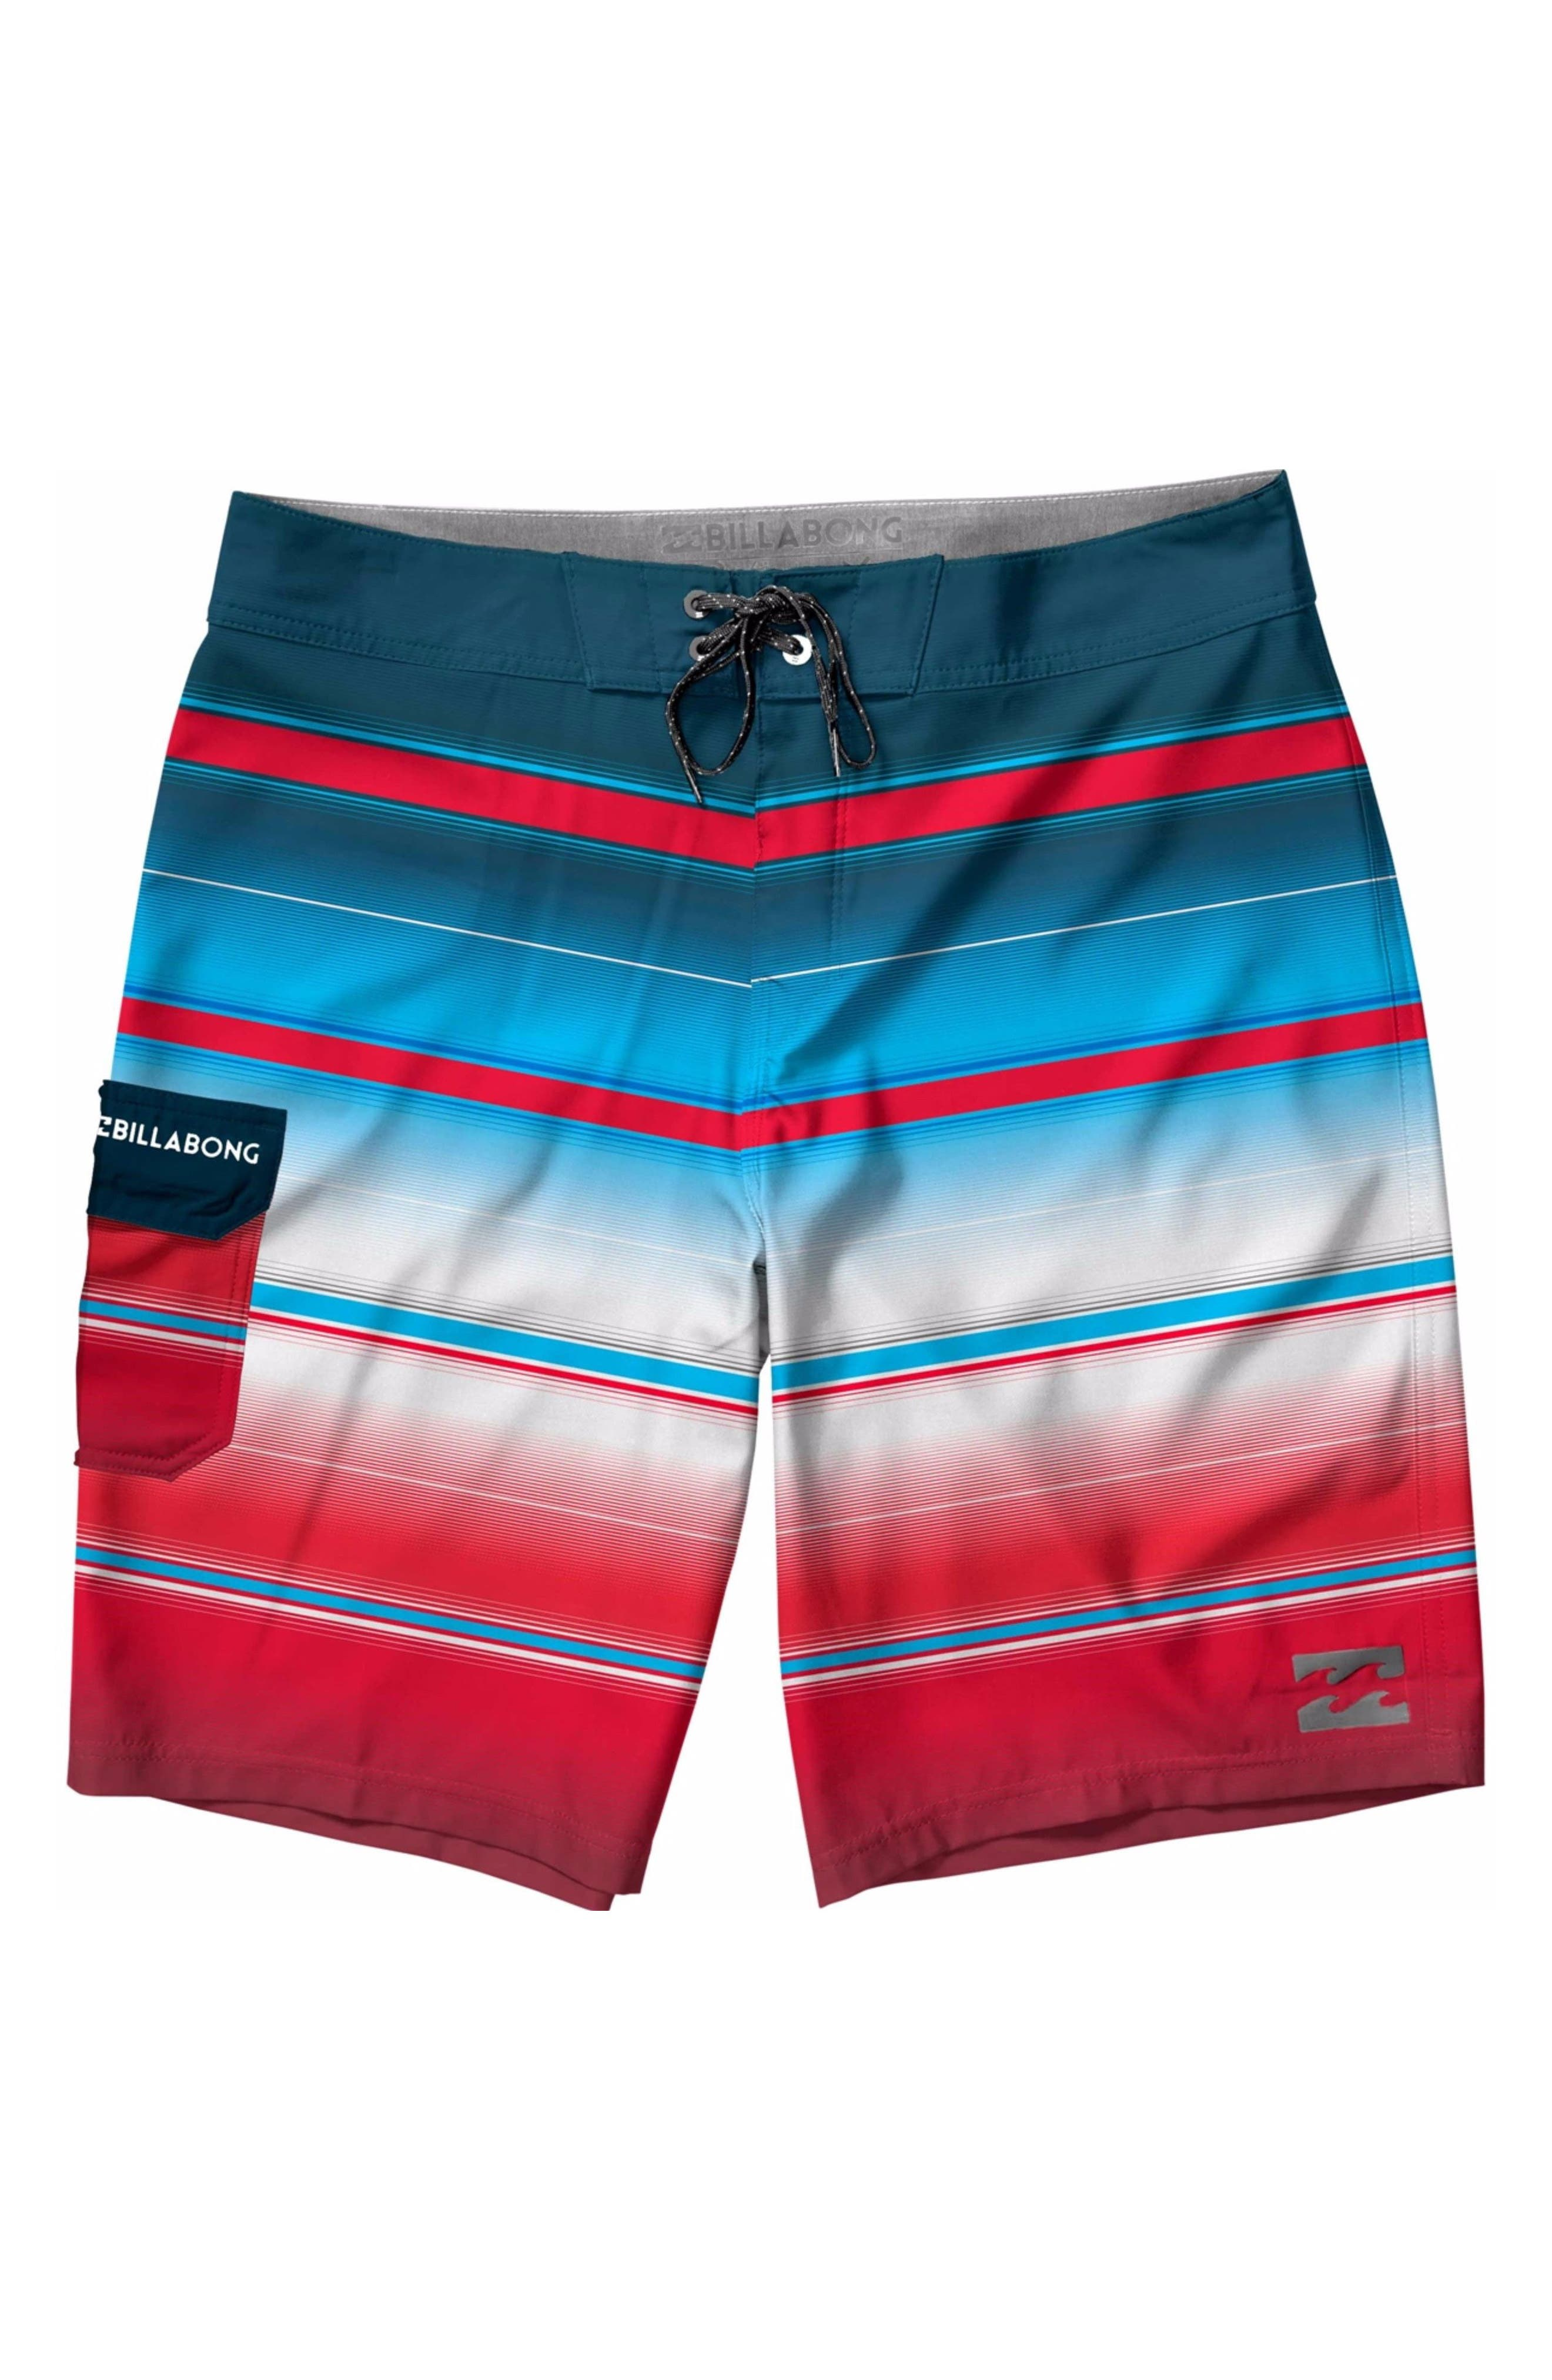 Alternate Image 1 Selected - Billabong All Day Stripe Board Shorts (Big Boys)